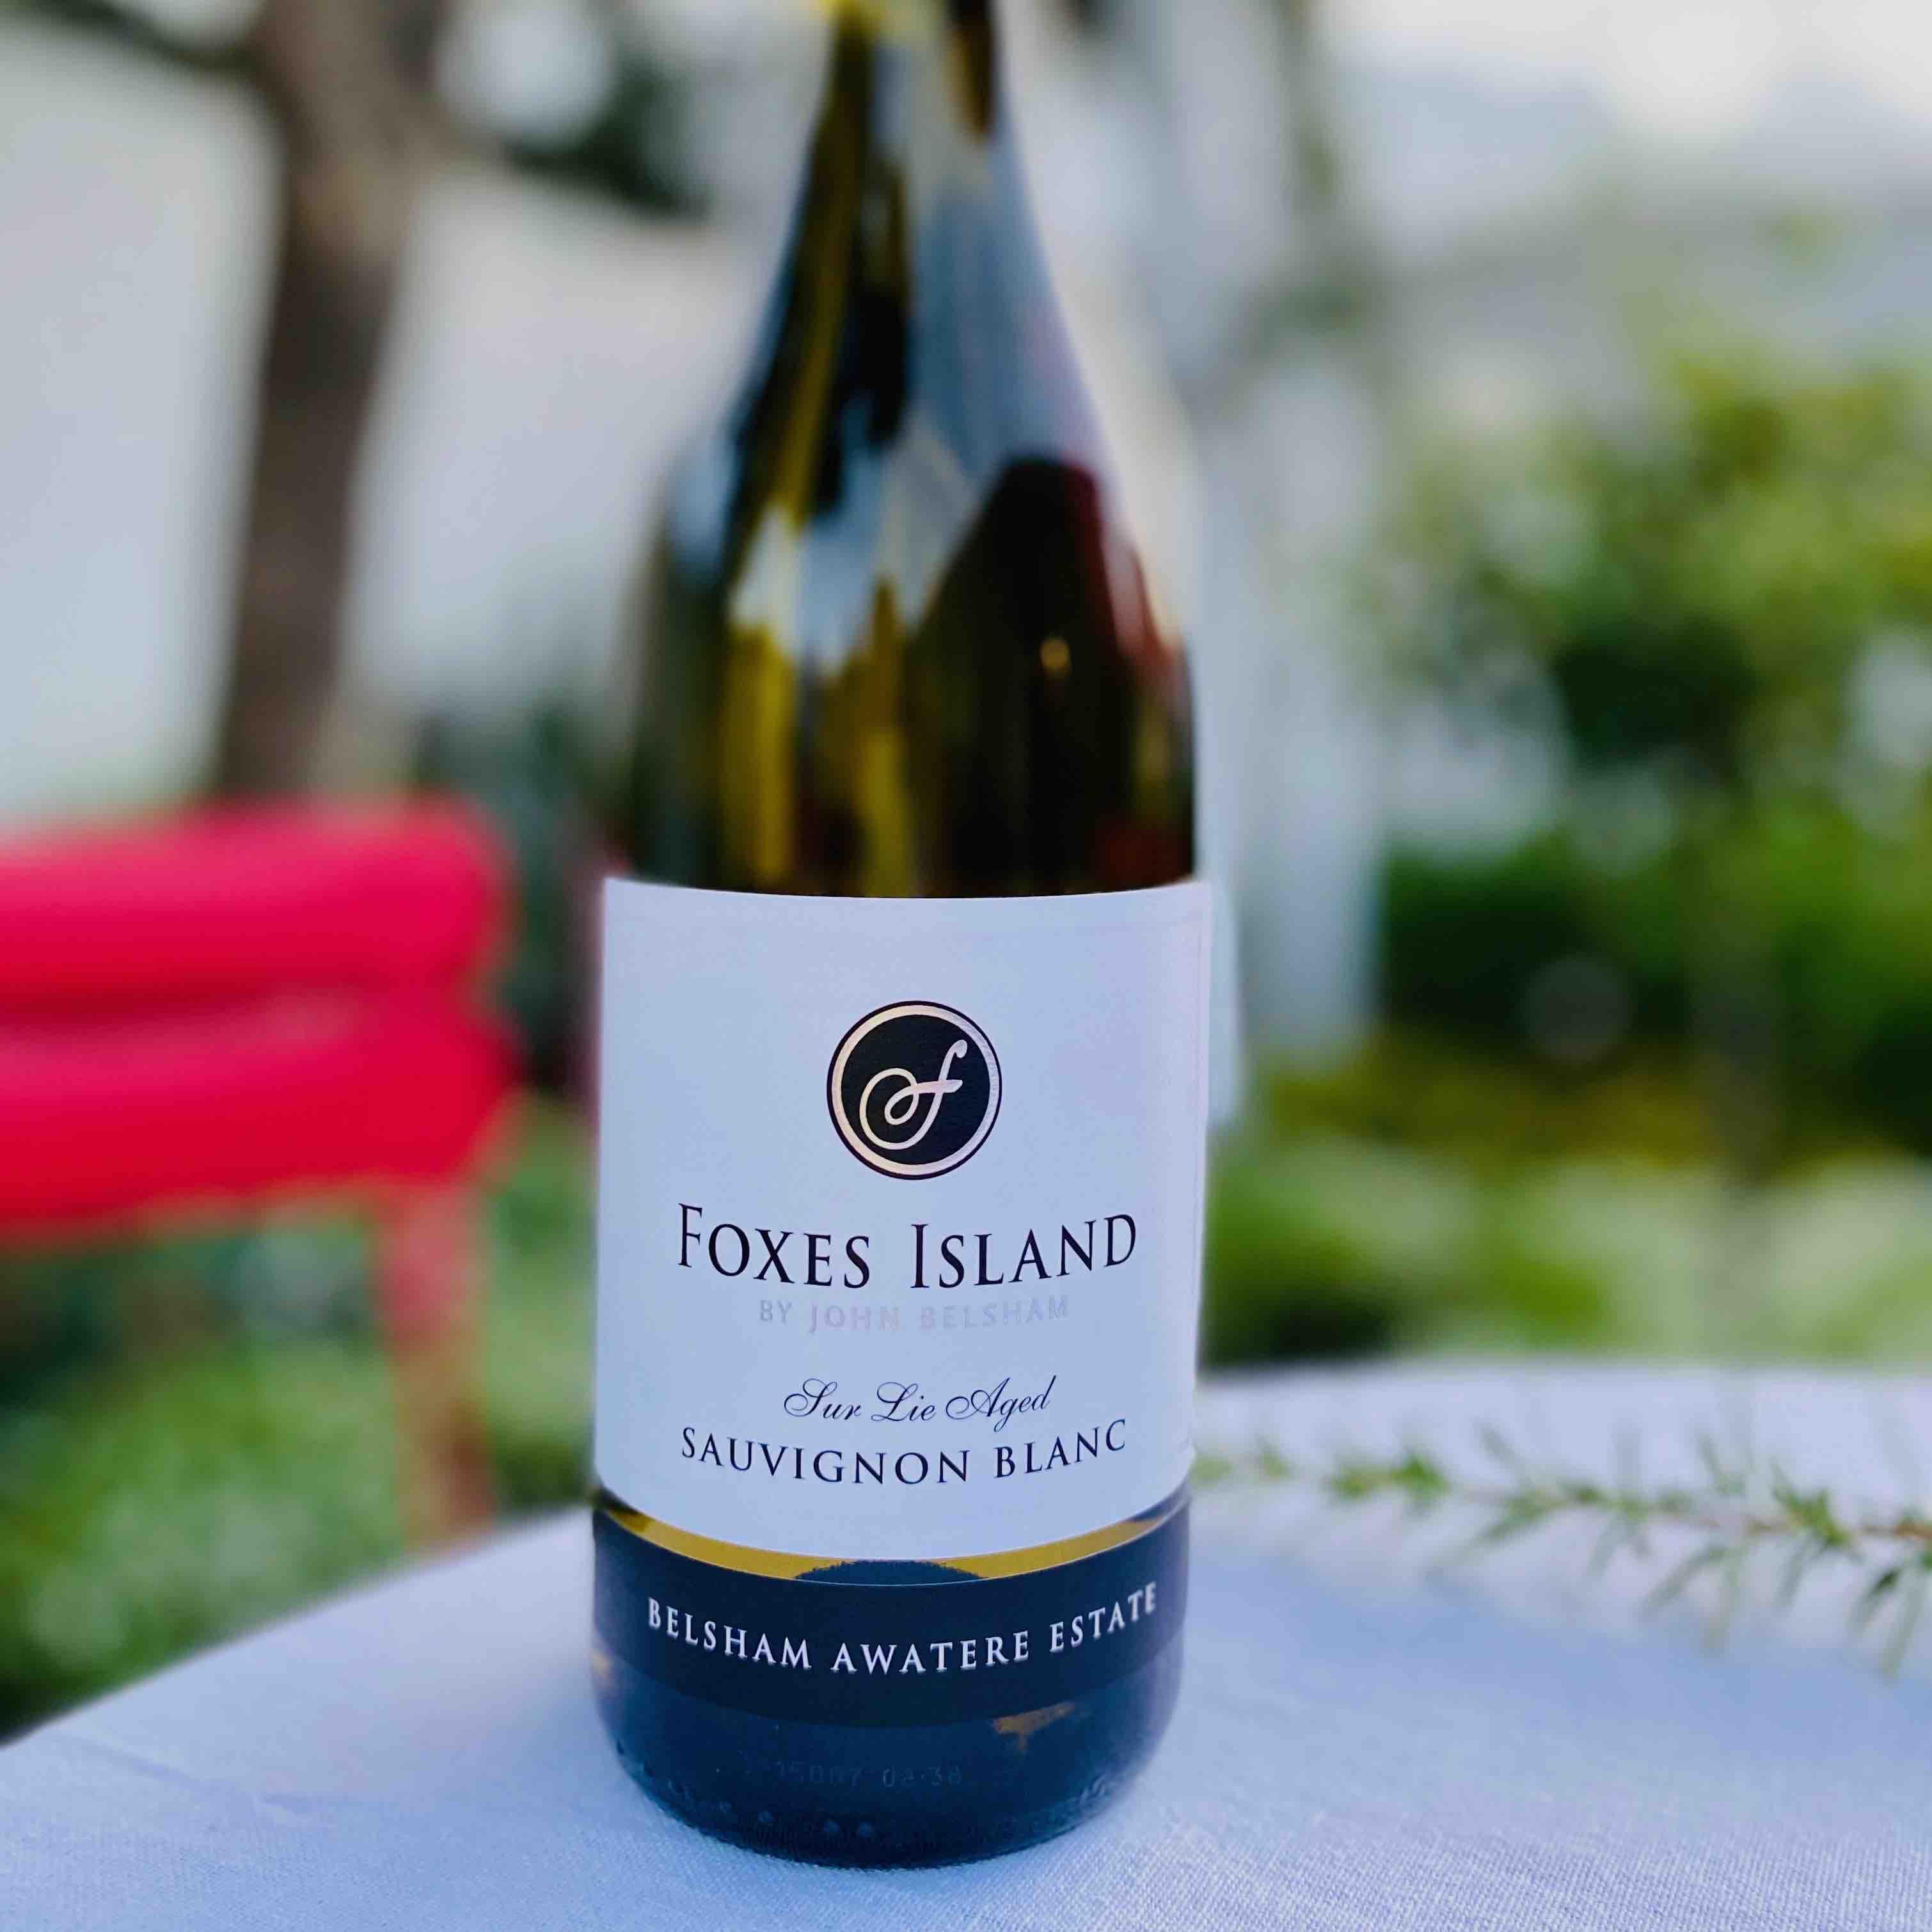 Foxes Island sur lie aged Sauvignon Blanc